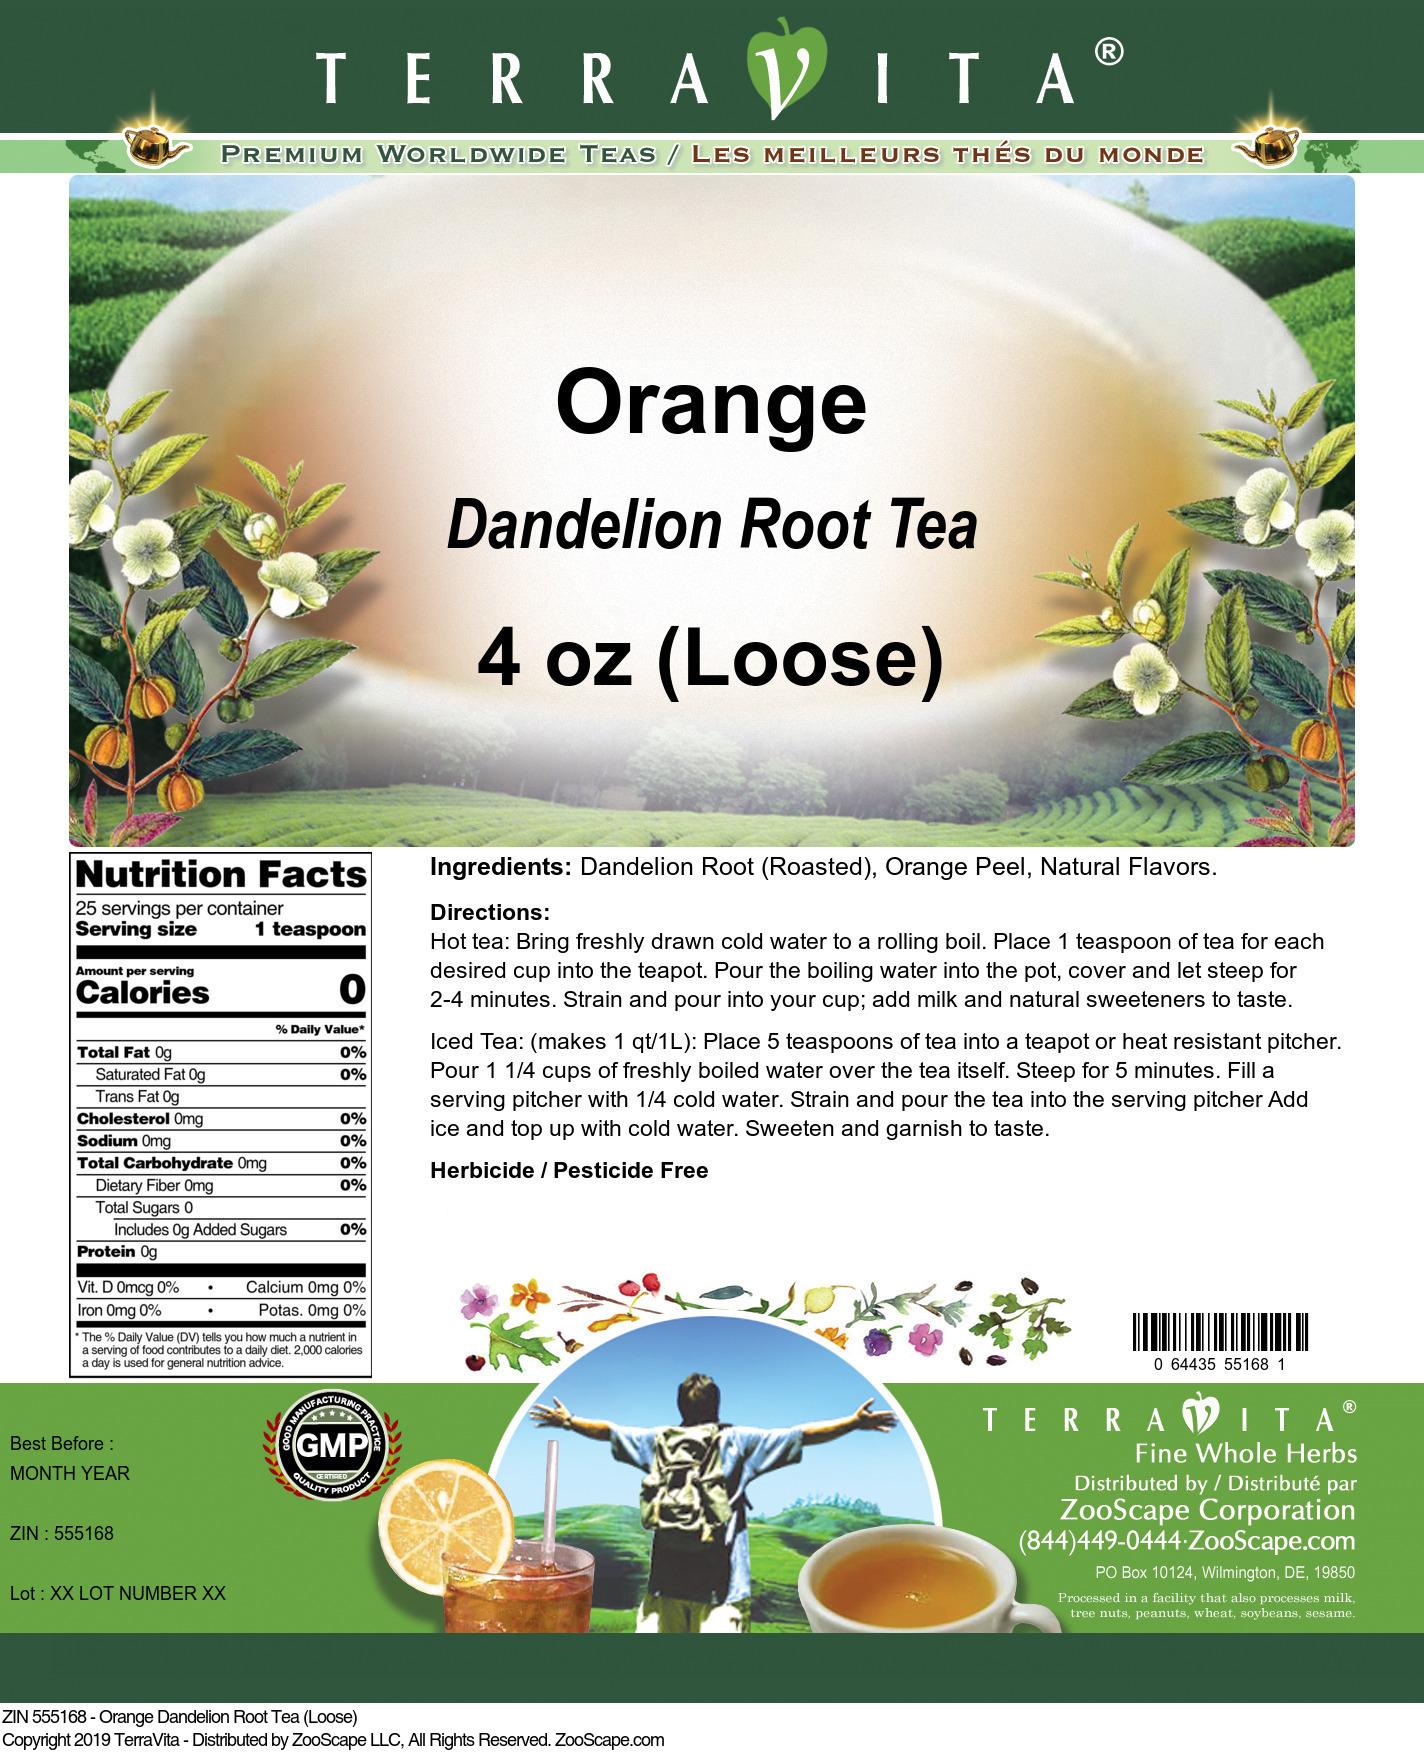 Orange Dandelion Root Tea (Loose)